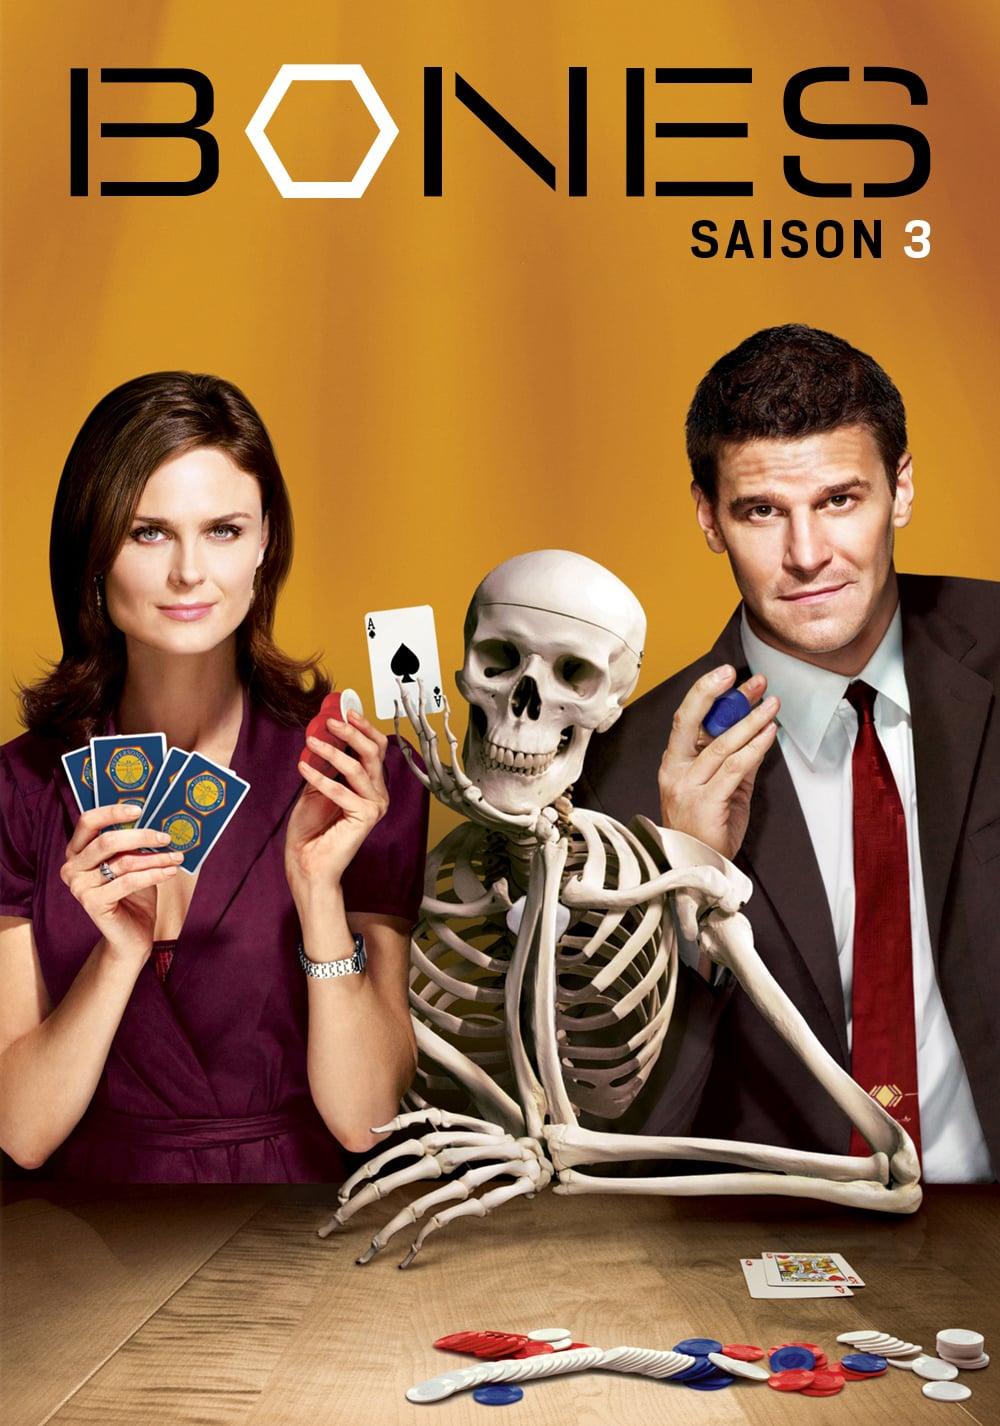 Image code-black-37495-episode-7-season-1.jpg